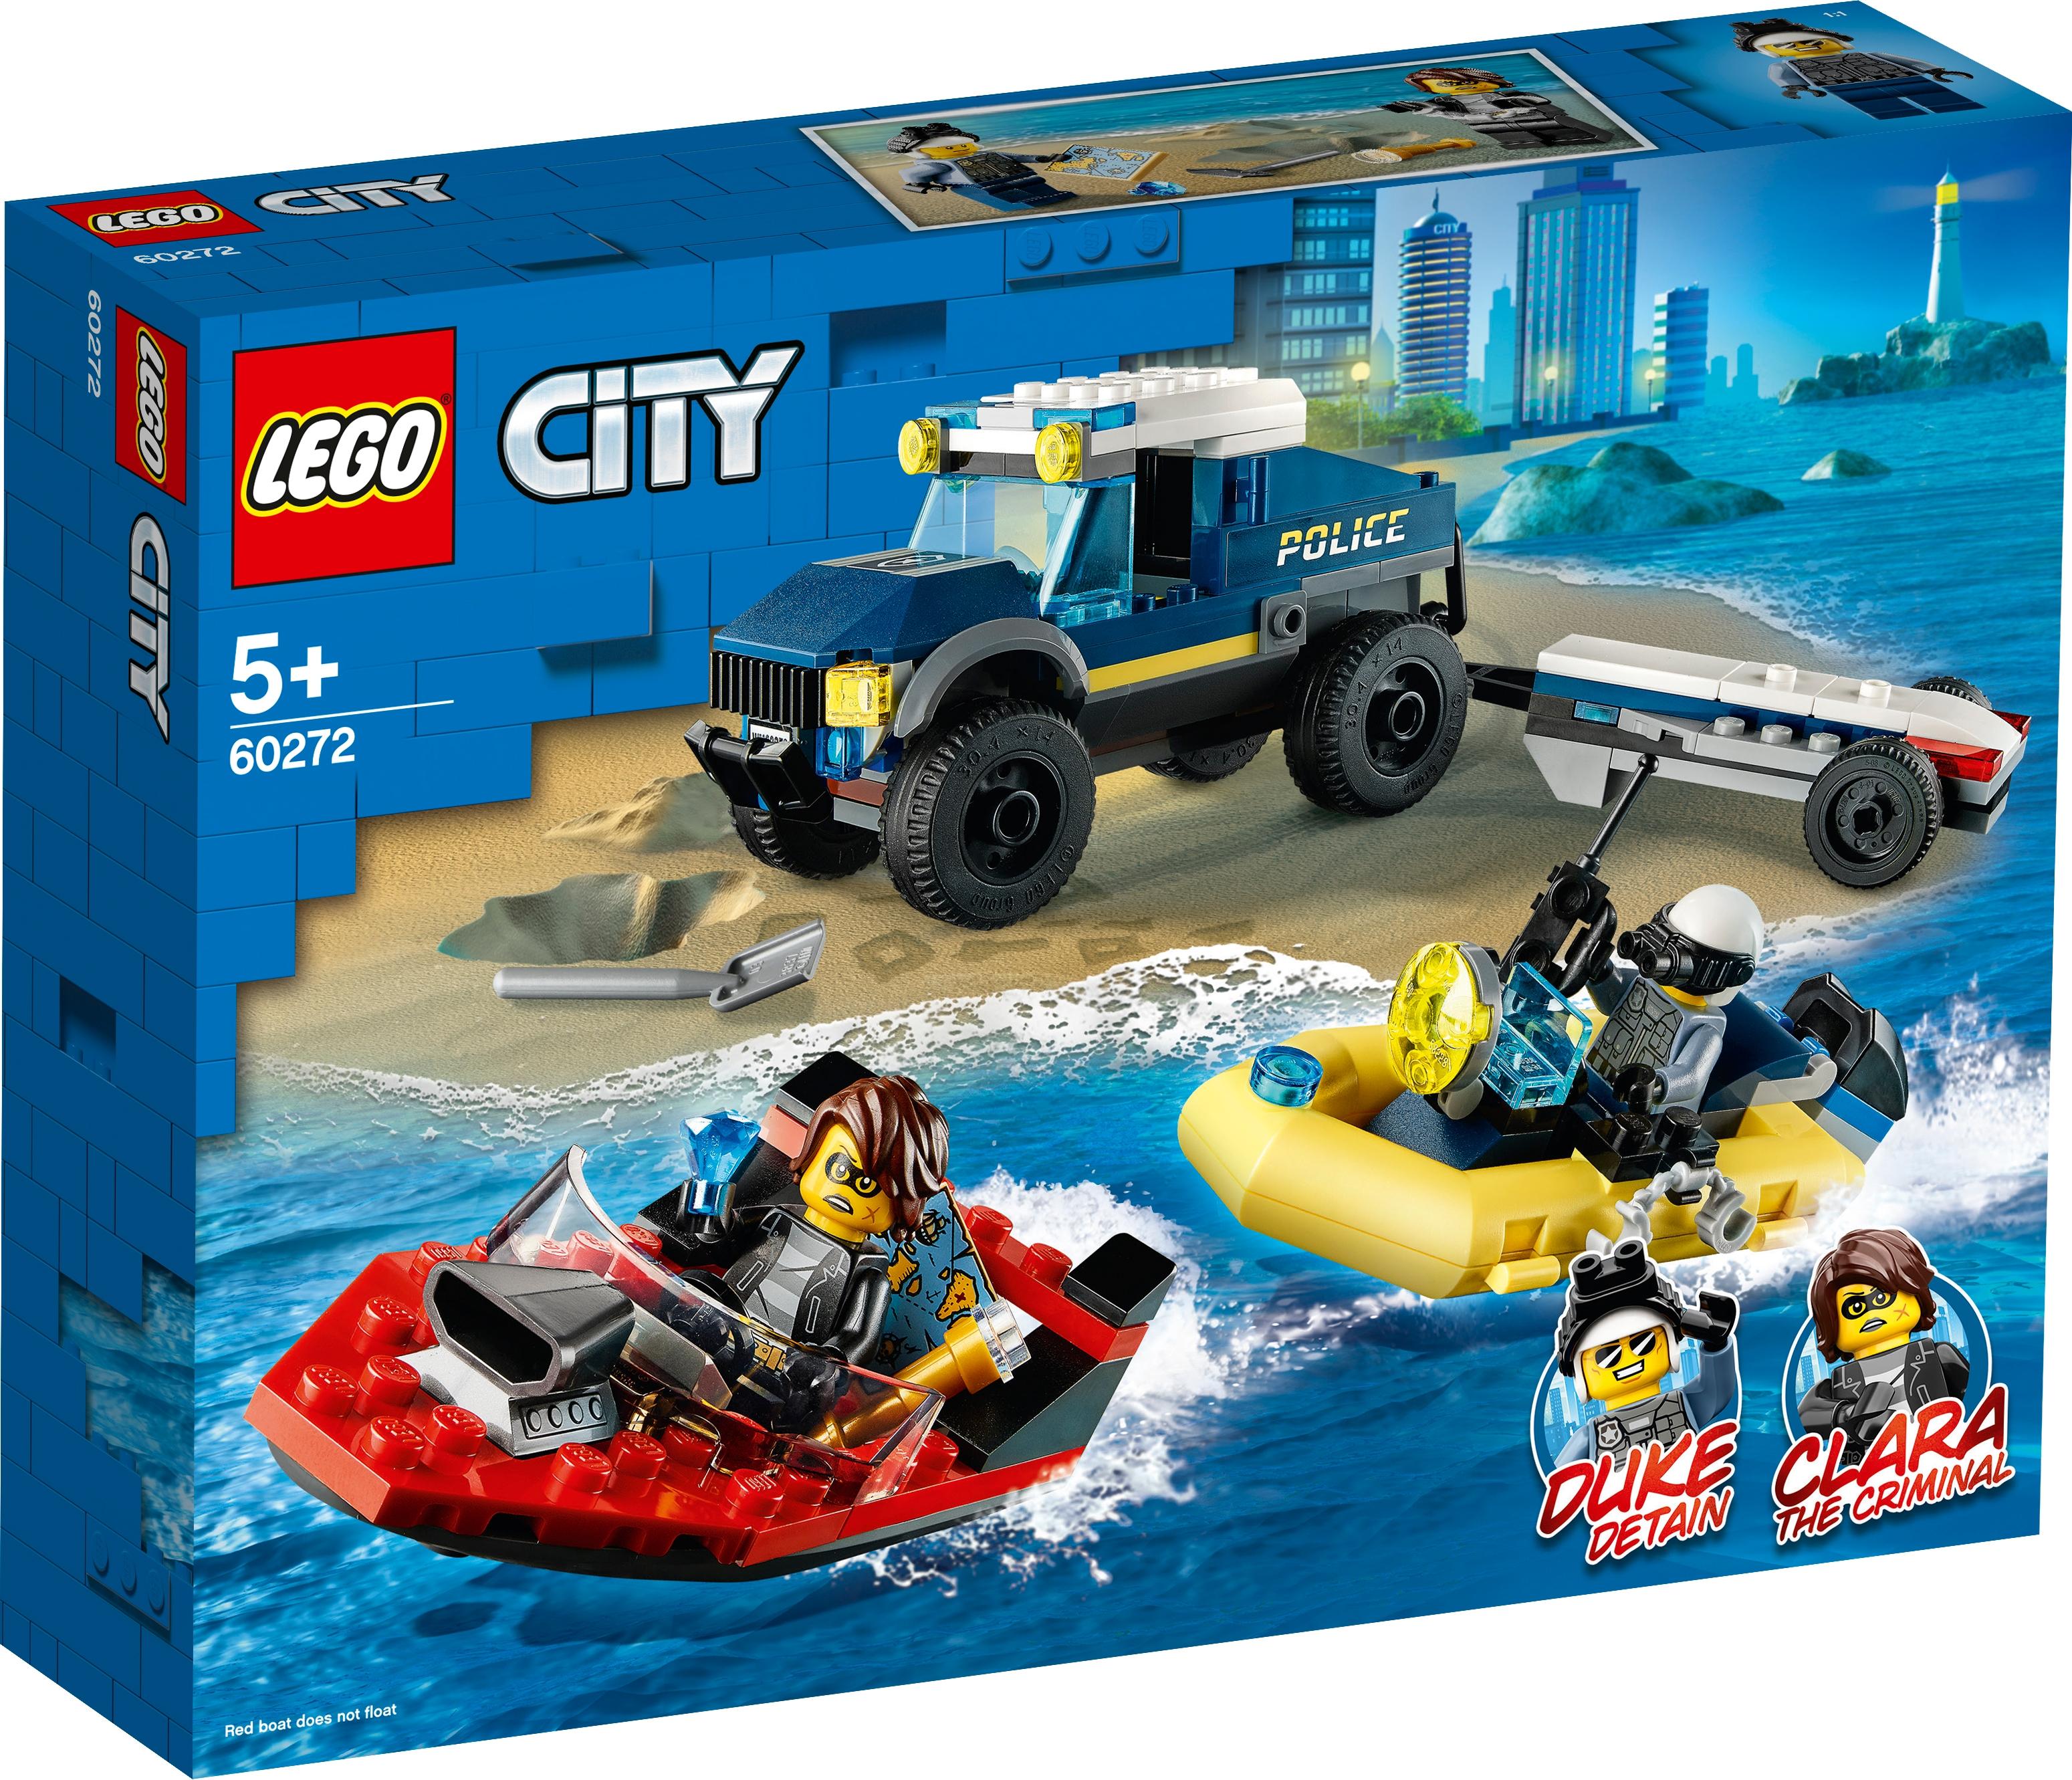 Elite Police Boat Transport 60272 City Buy Online At The Official Lego Shop Nl